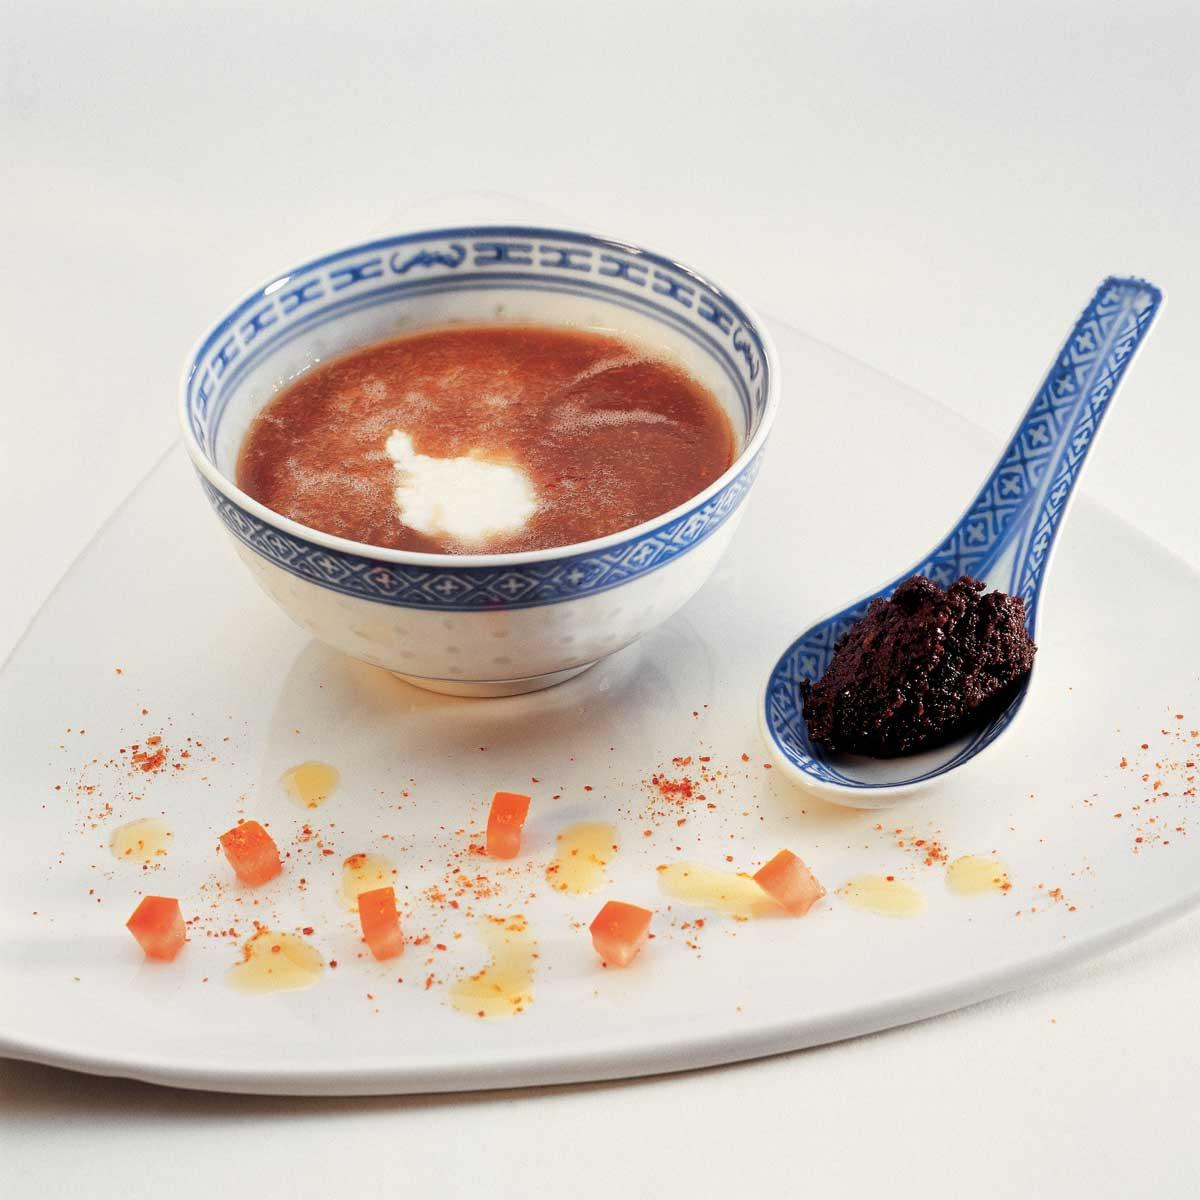 recette soupe de tomate froide au basilic cuisine madame figaro. Black Bedroom Furniture Sets. Home Design Ideas